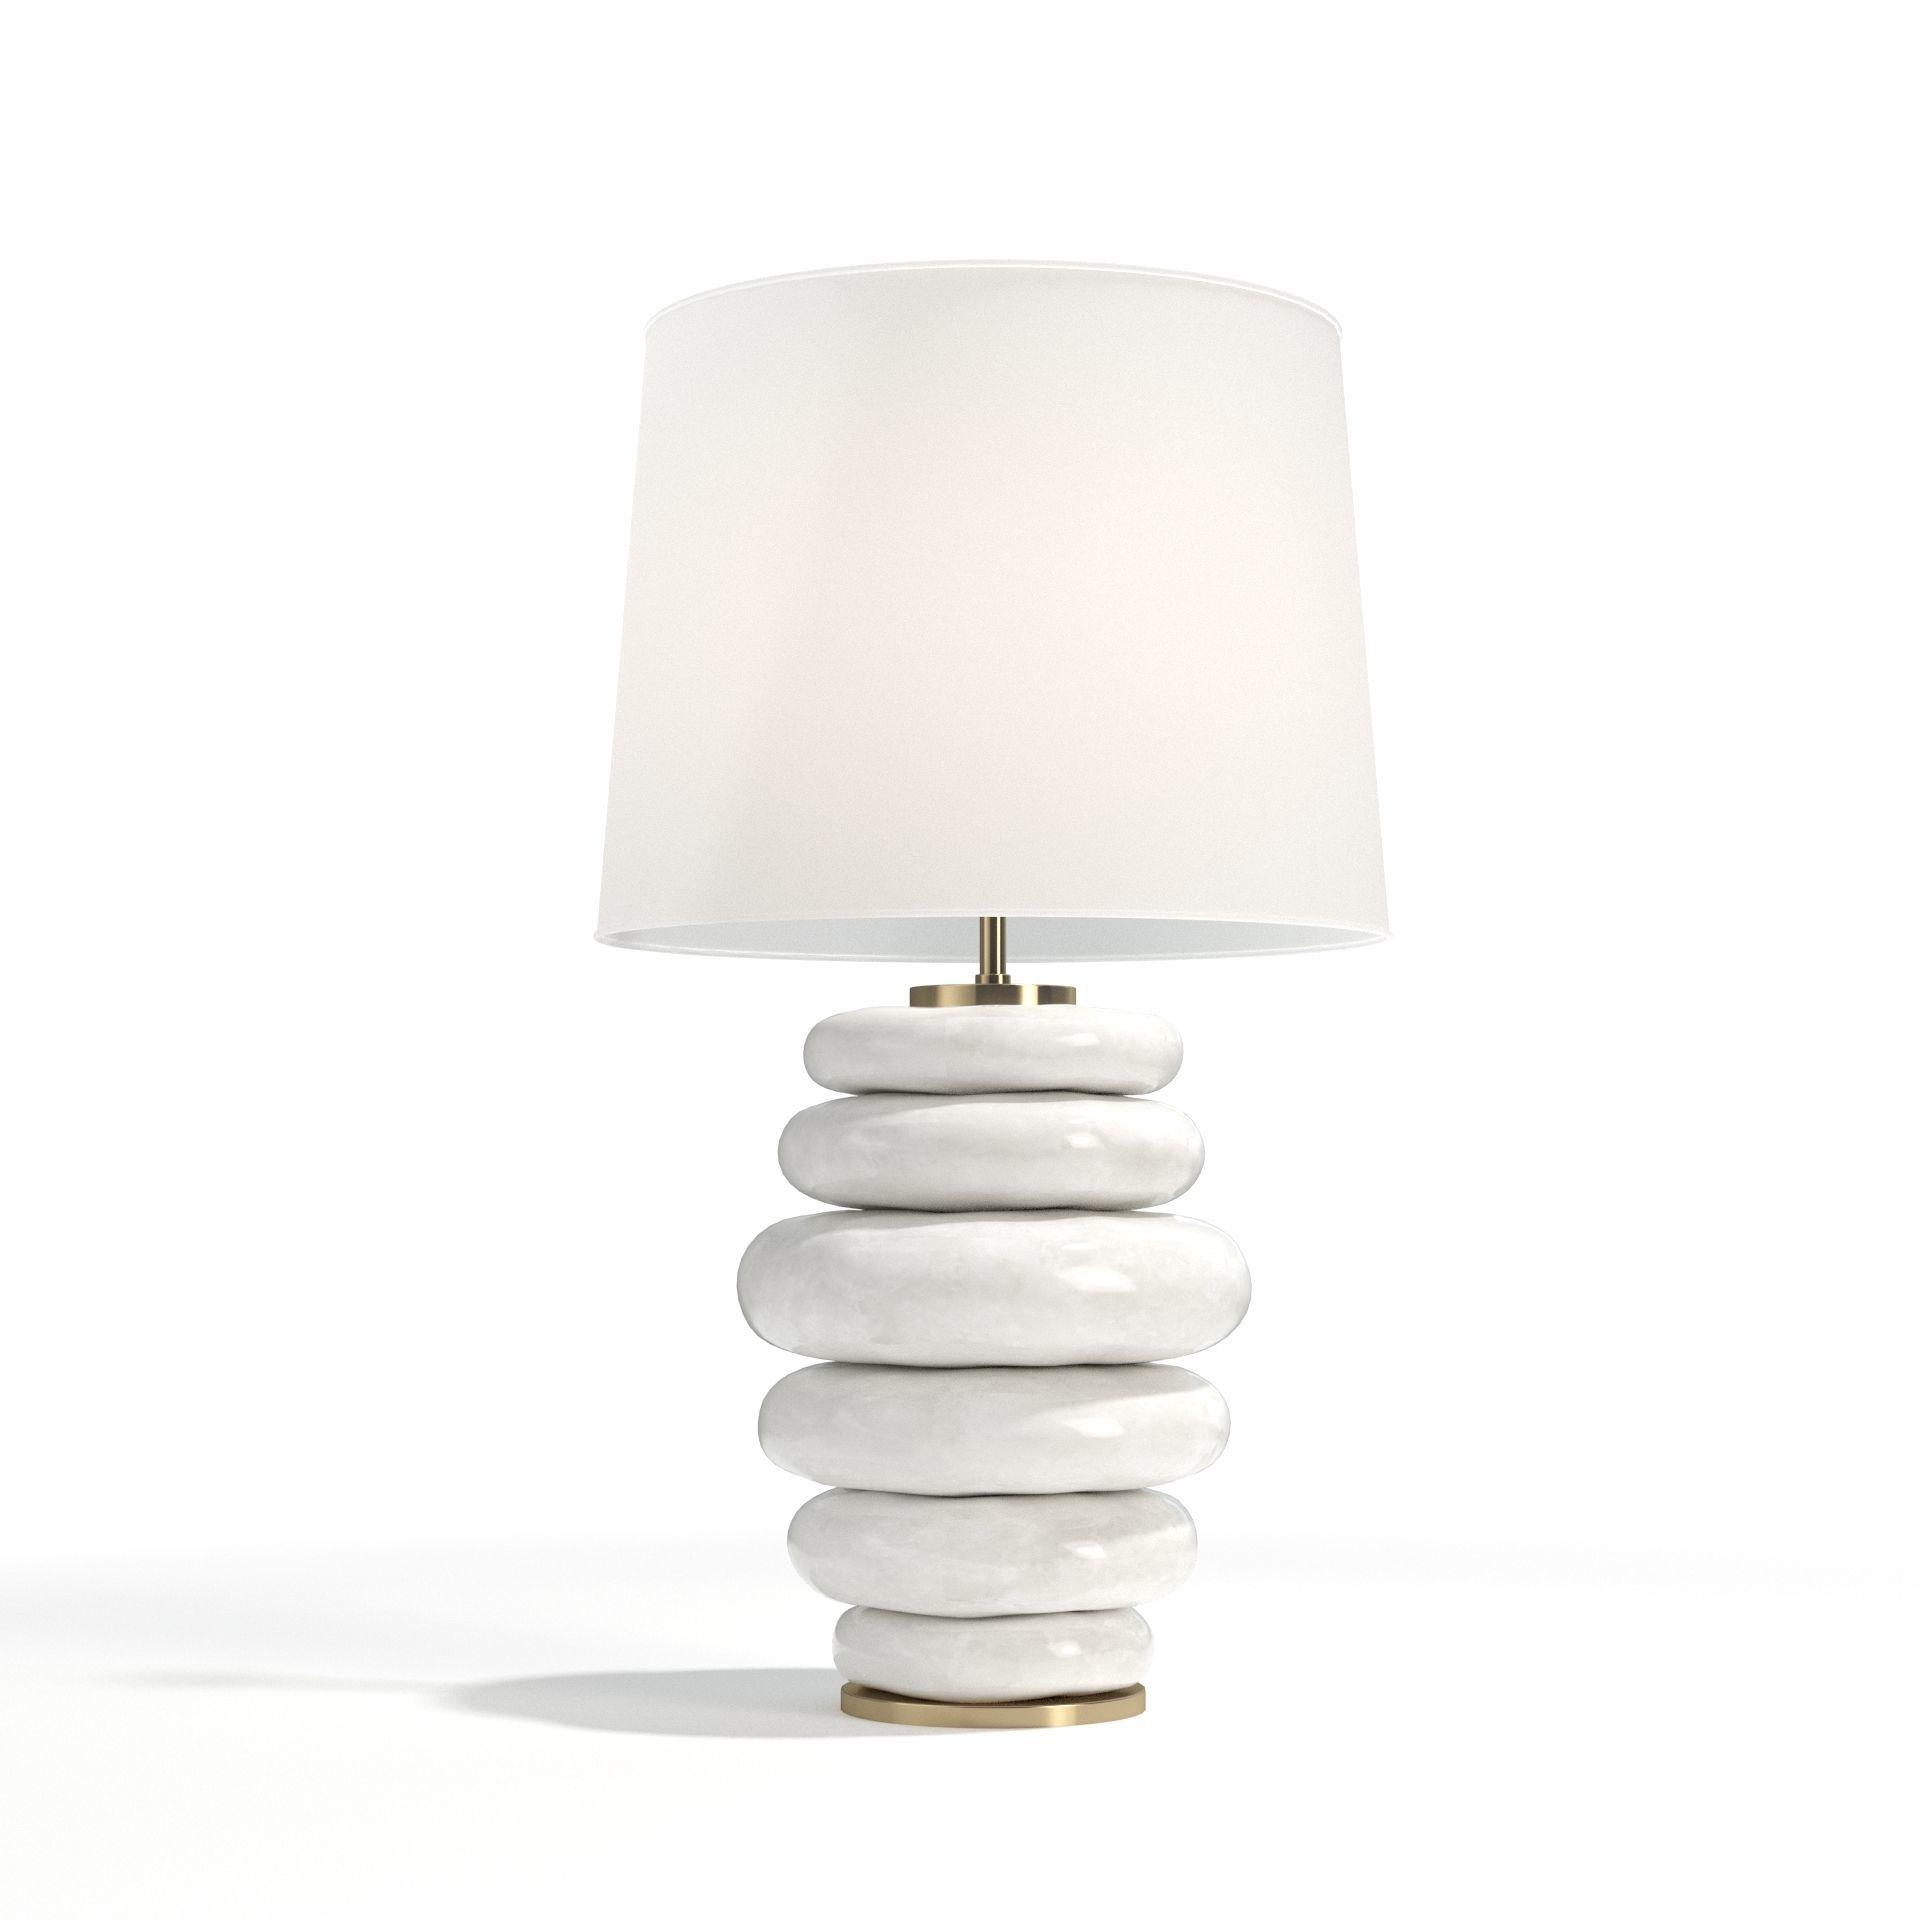 Circa Lighting Phoebe Stacked Table Lamp Model